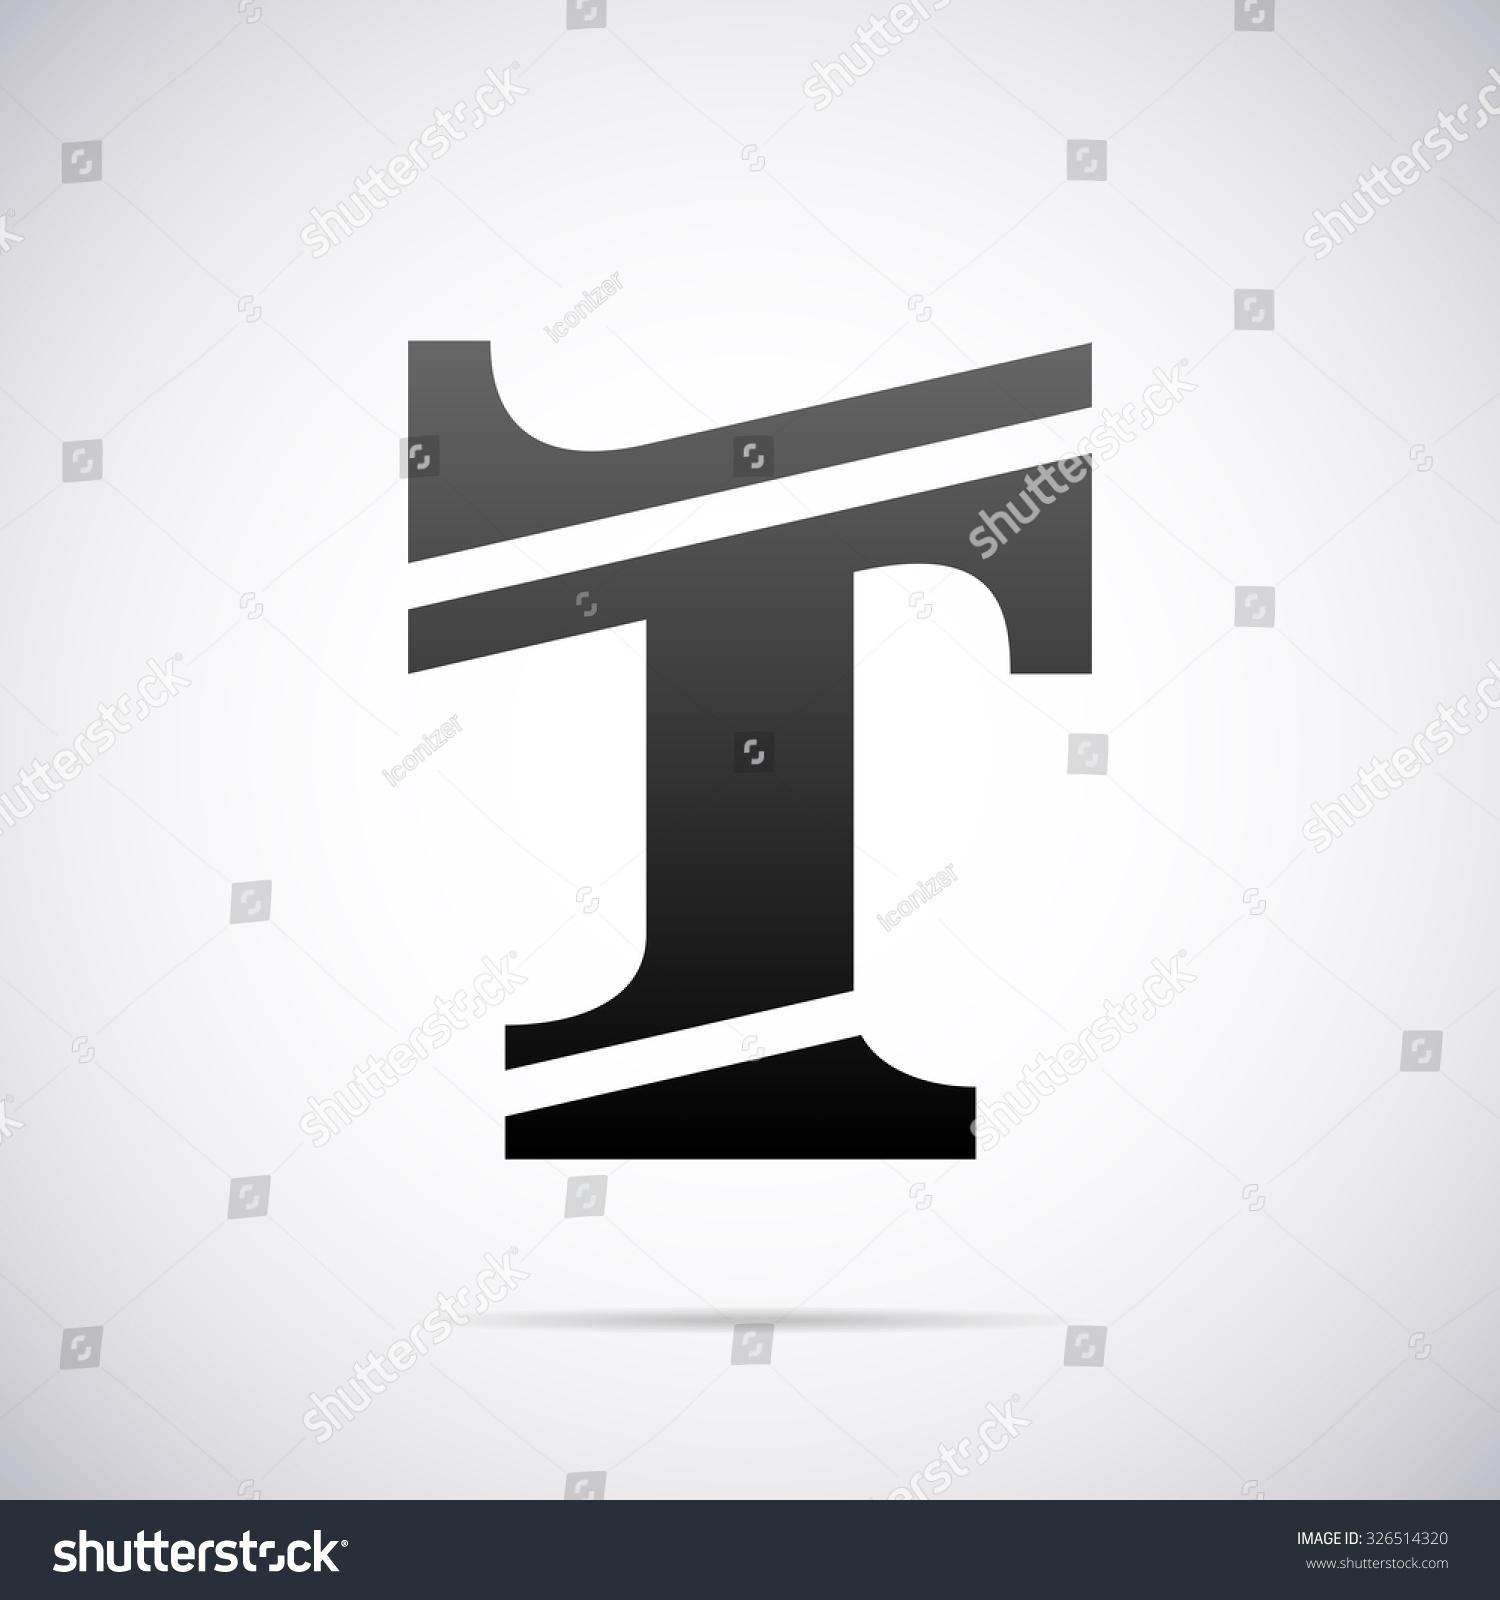 Logo letter t design template stock vector 326514320 for Letter t decoration